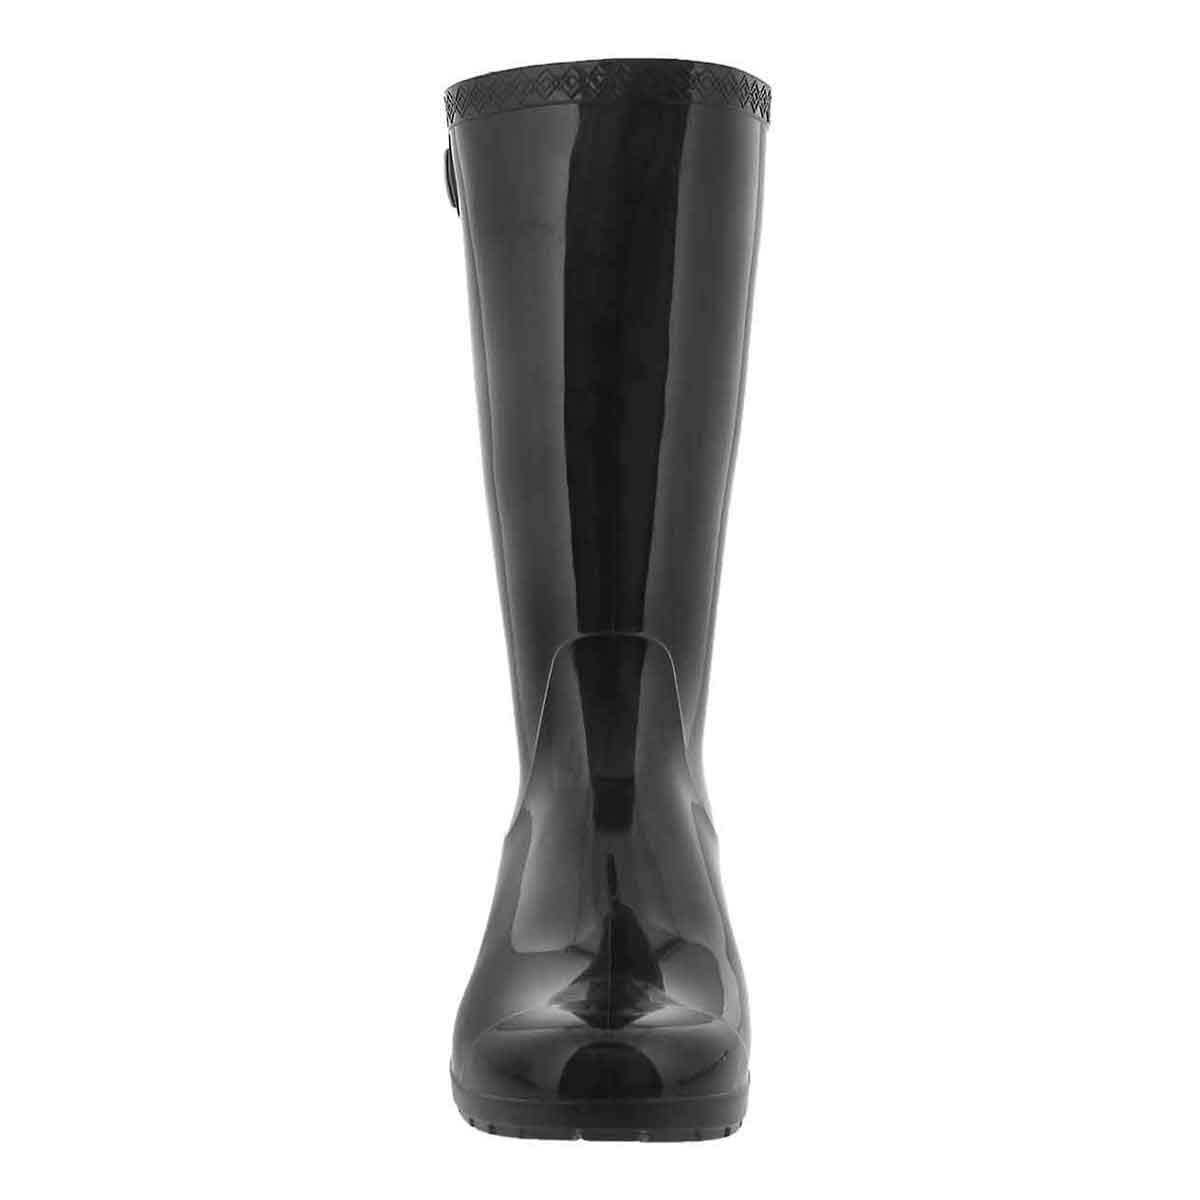 Lds Shaye black wtpf rain boot